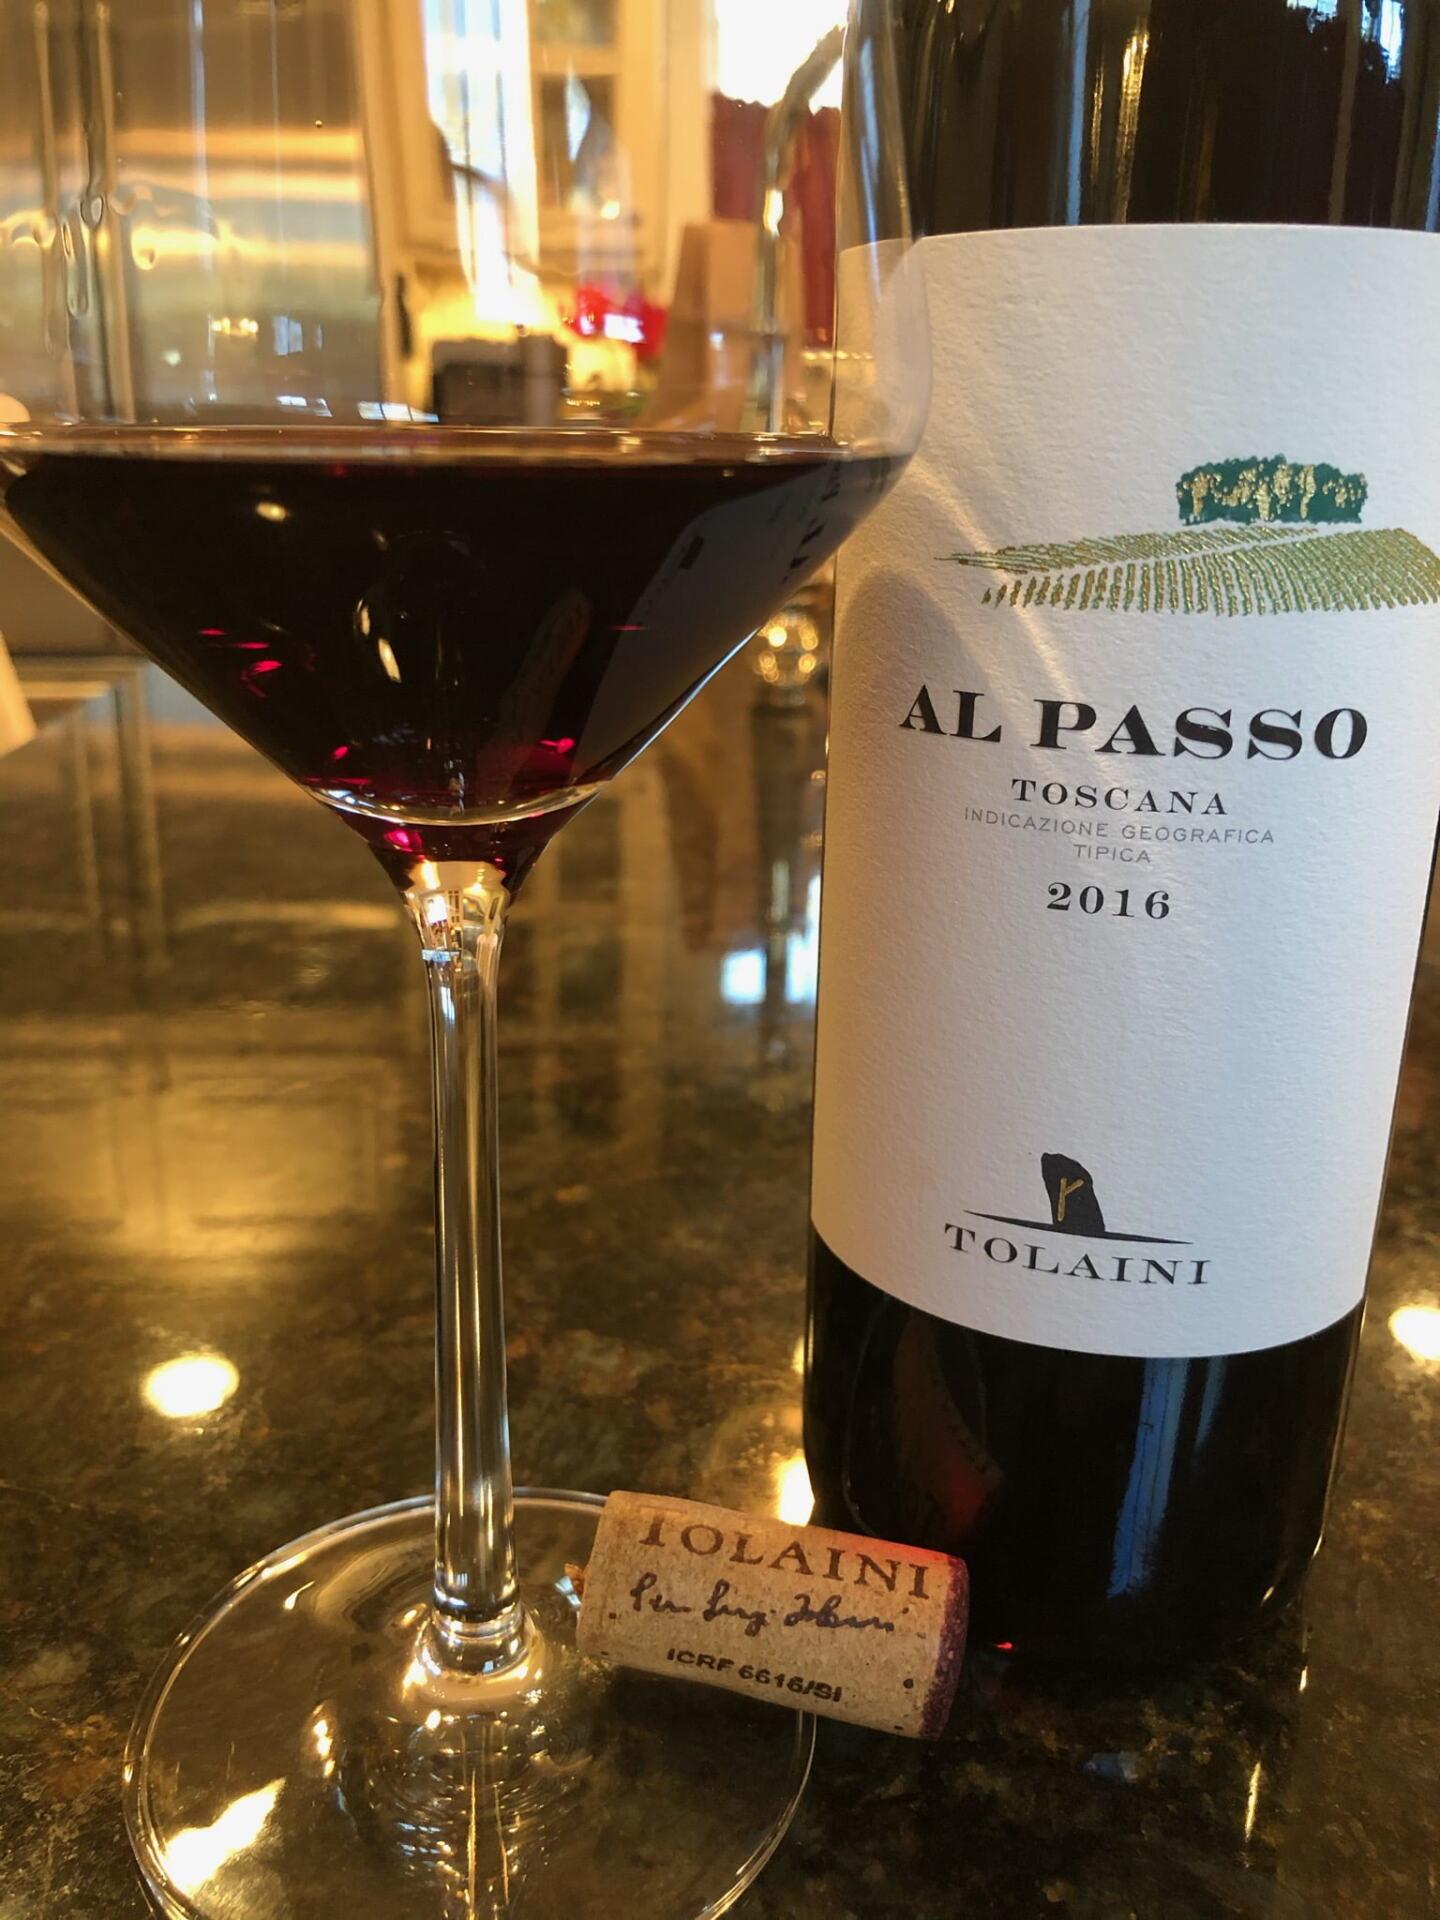 Al Passo bottle of wine